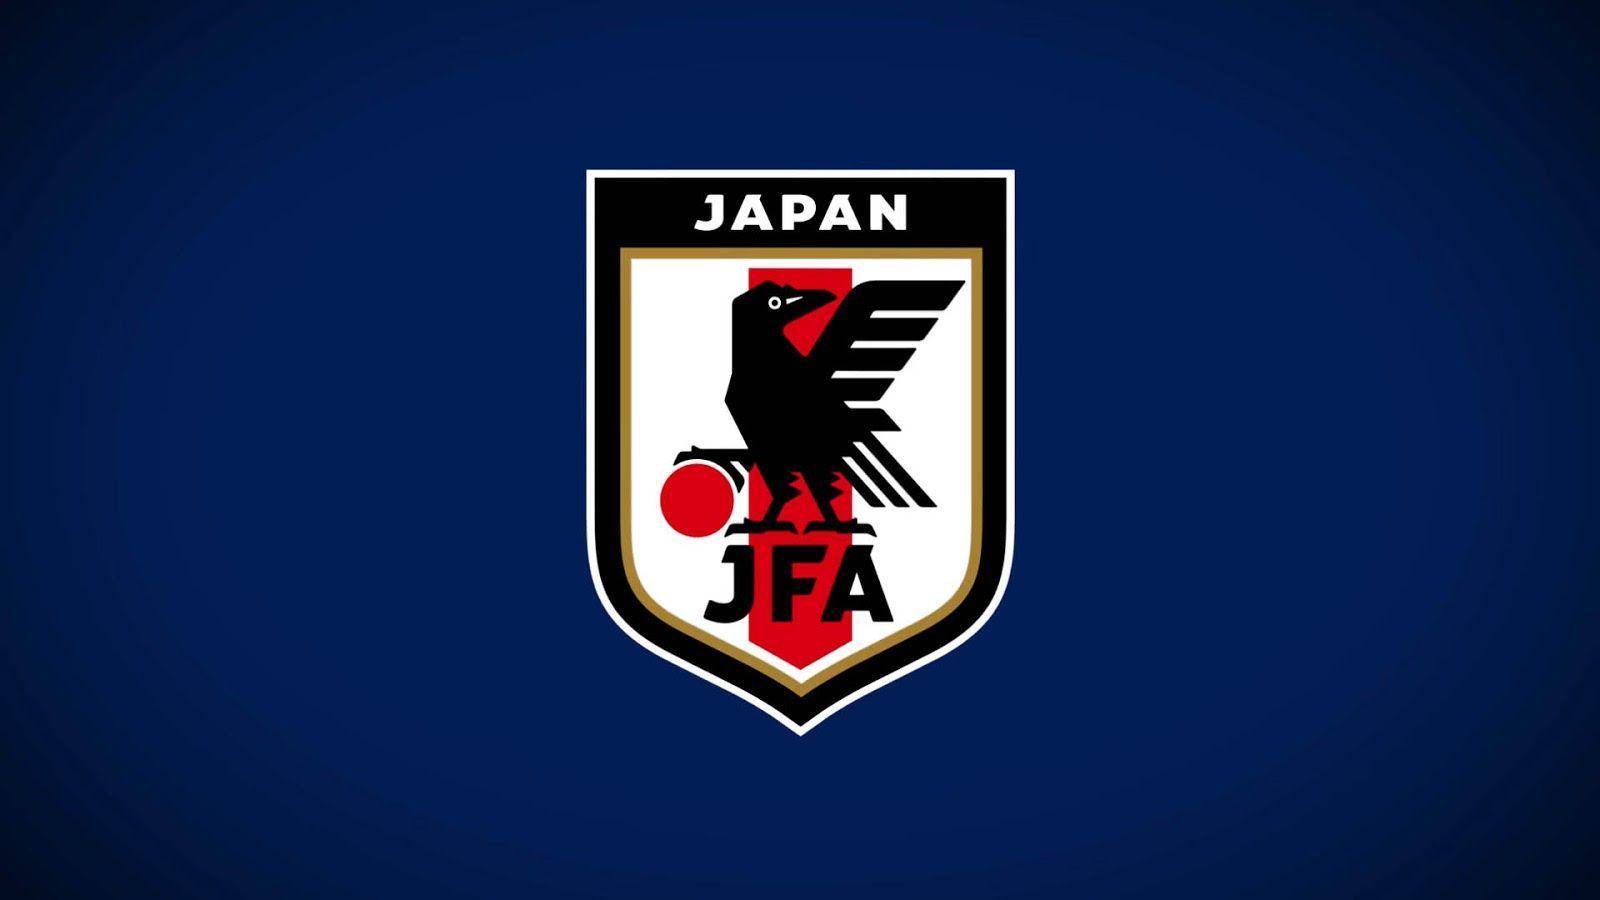 Japan National Football Team Teams Background 6